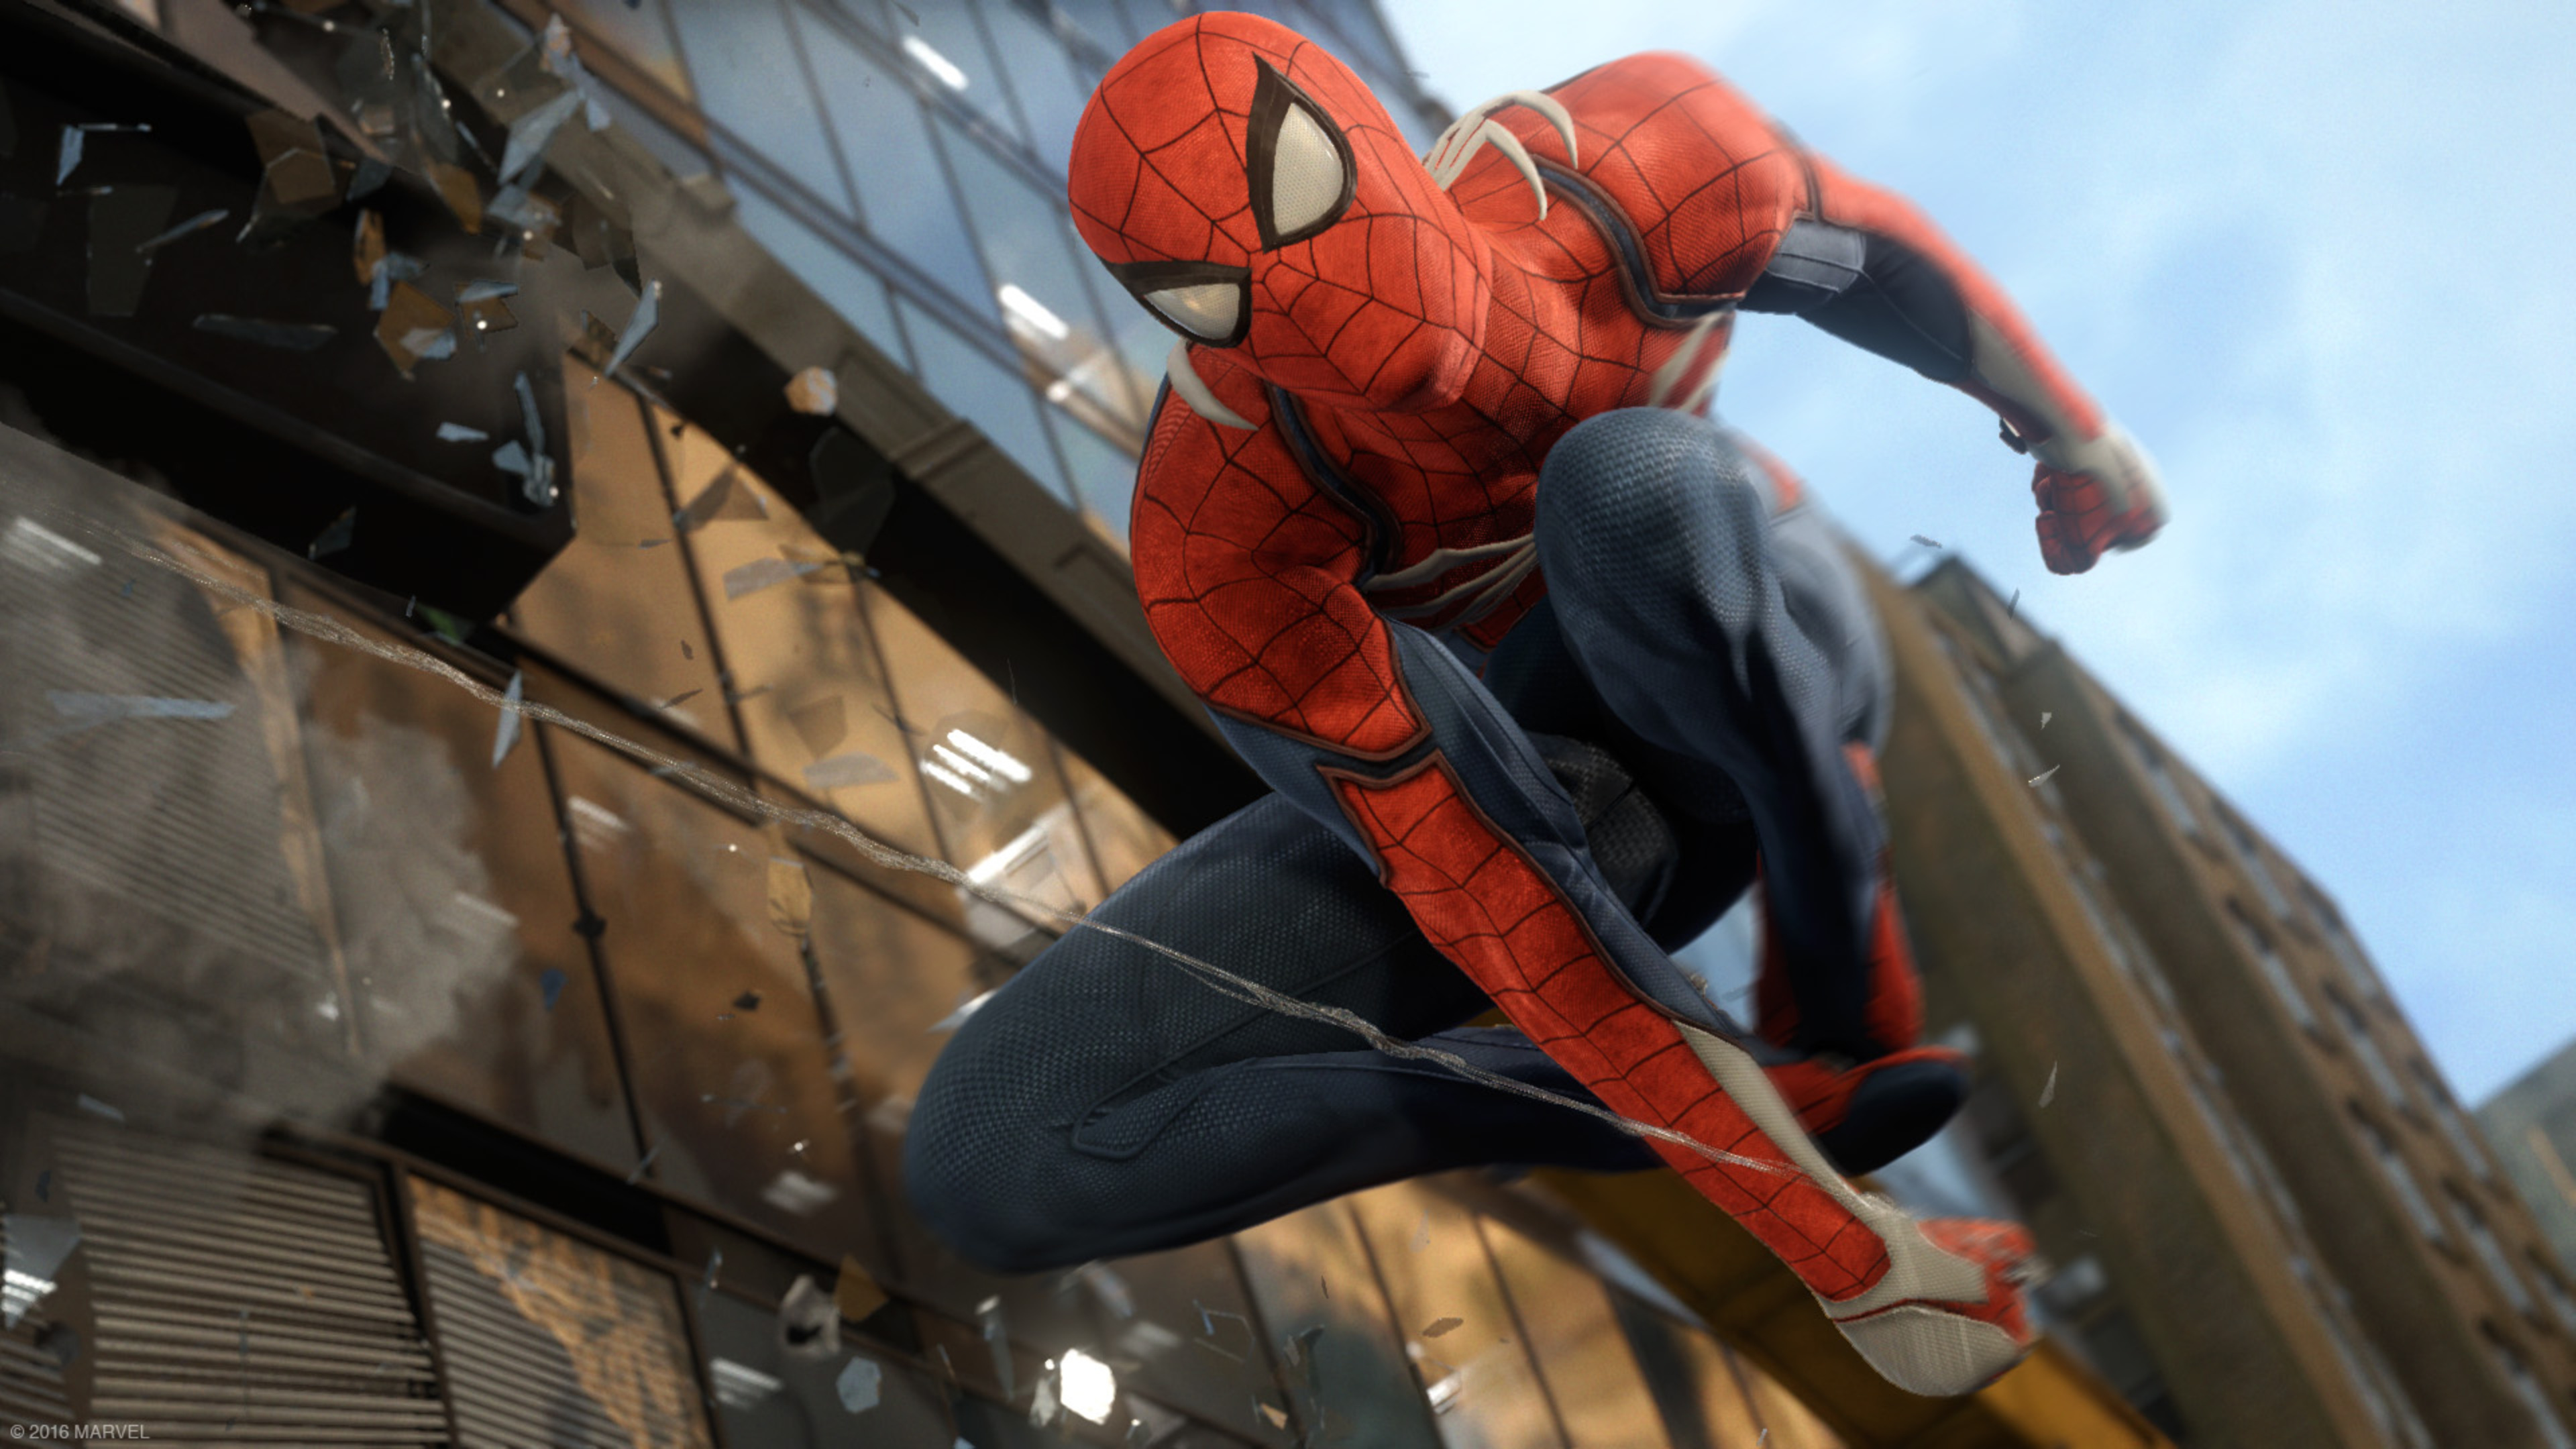 spiderman-ps4-hd.jpg